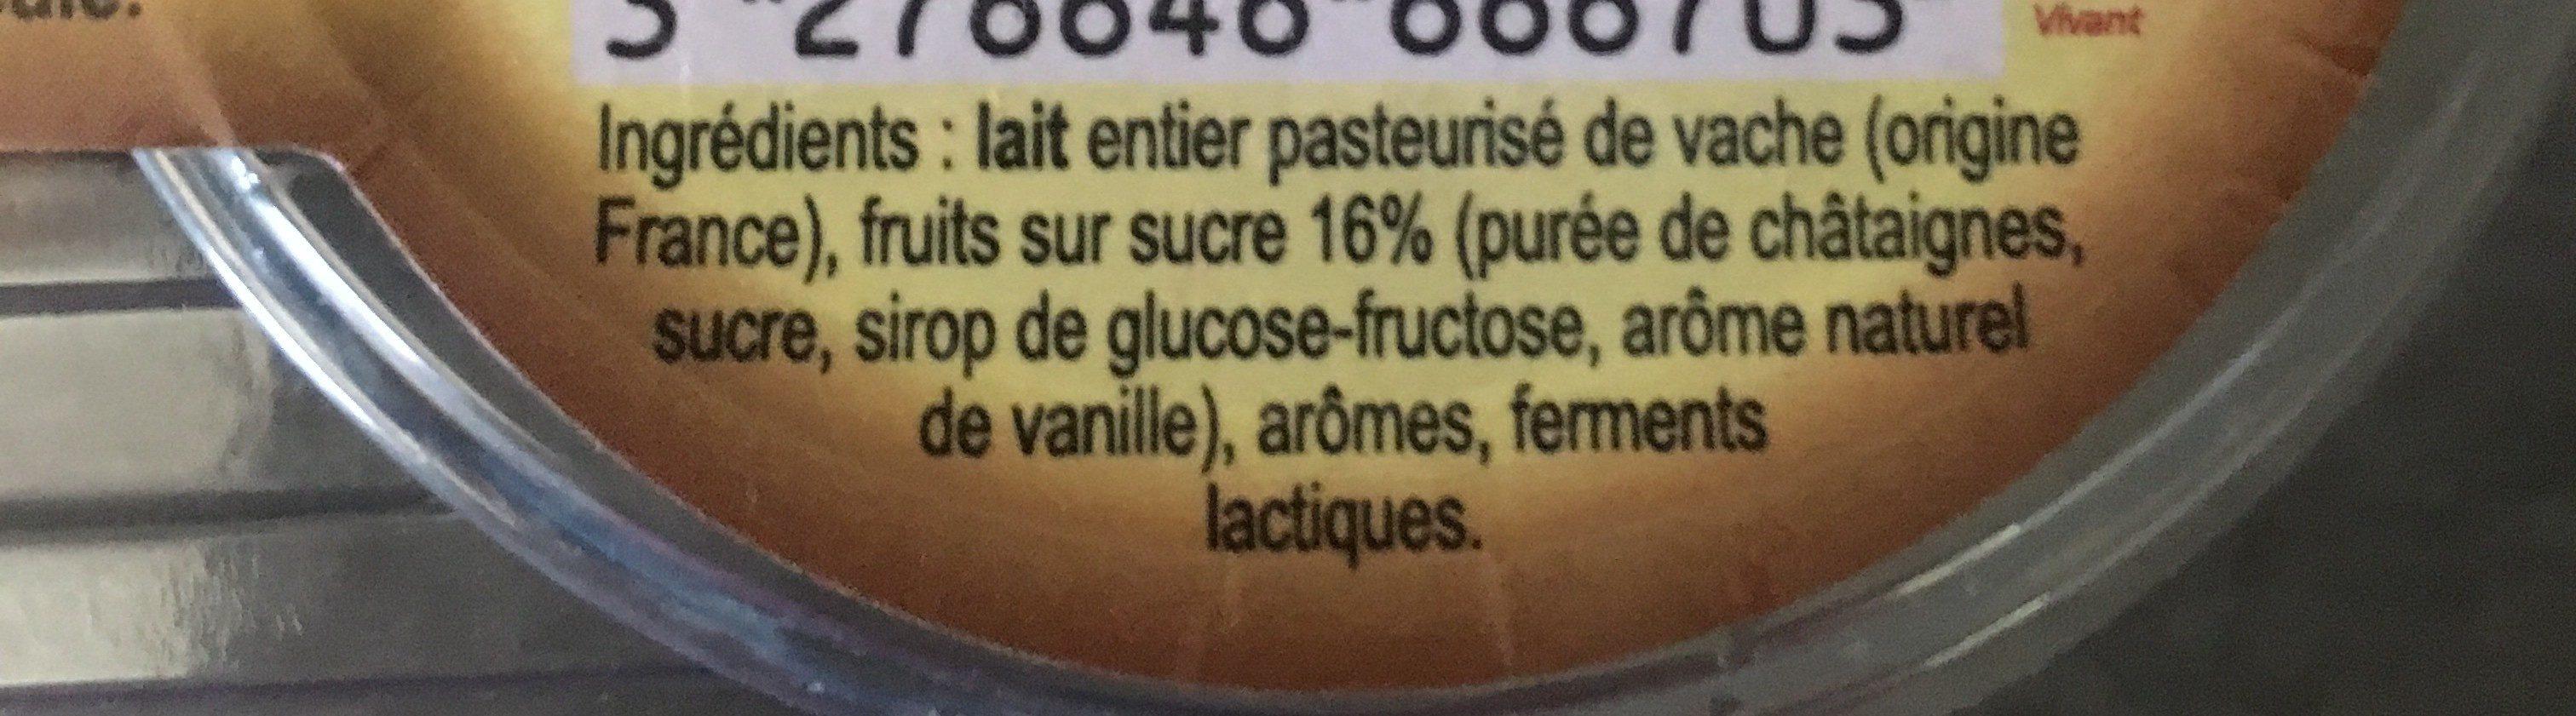 Yaourts des hautes-alpes - Ingrediënten - fr